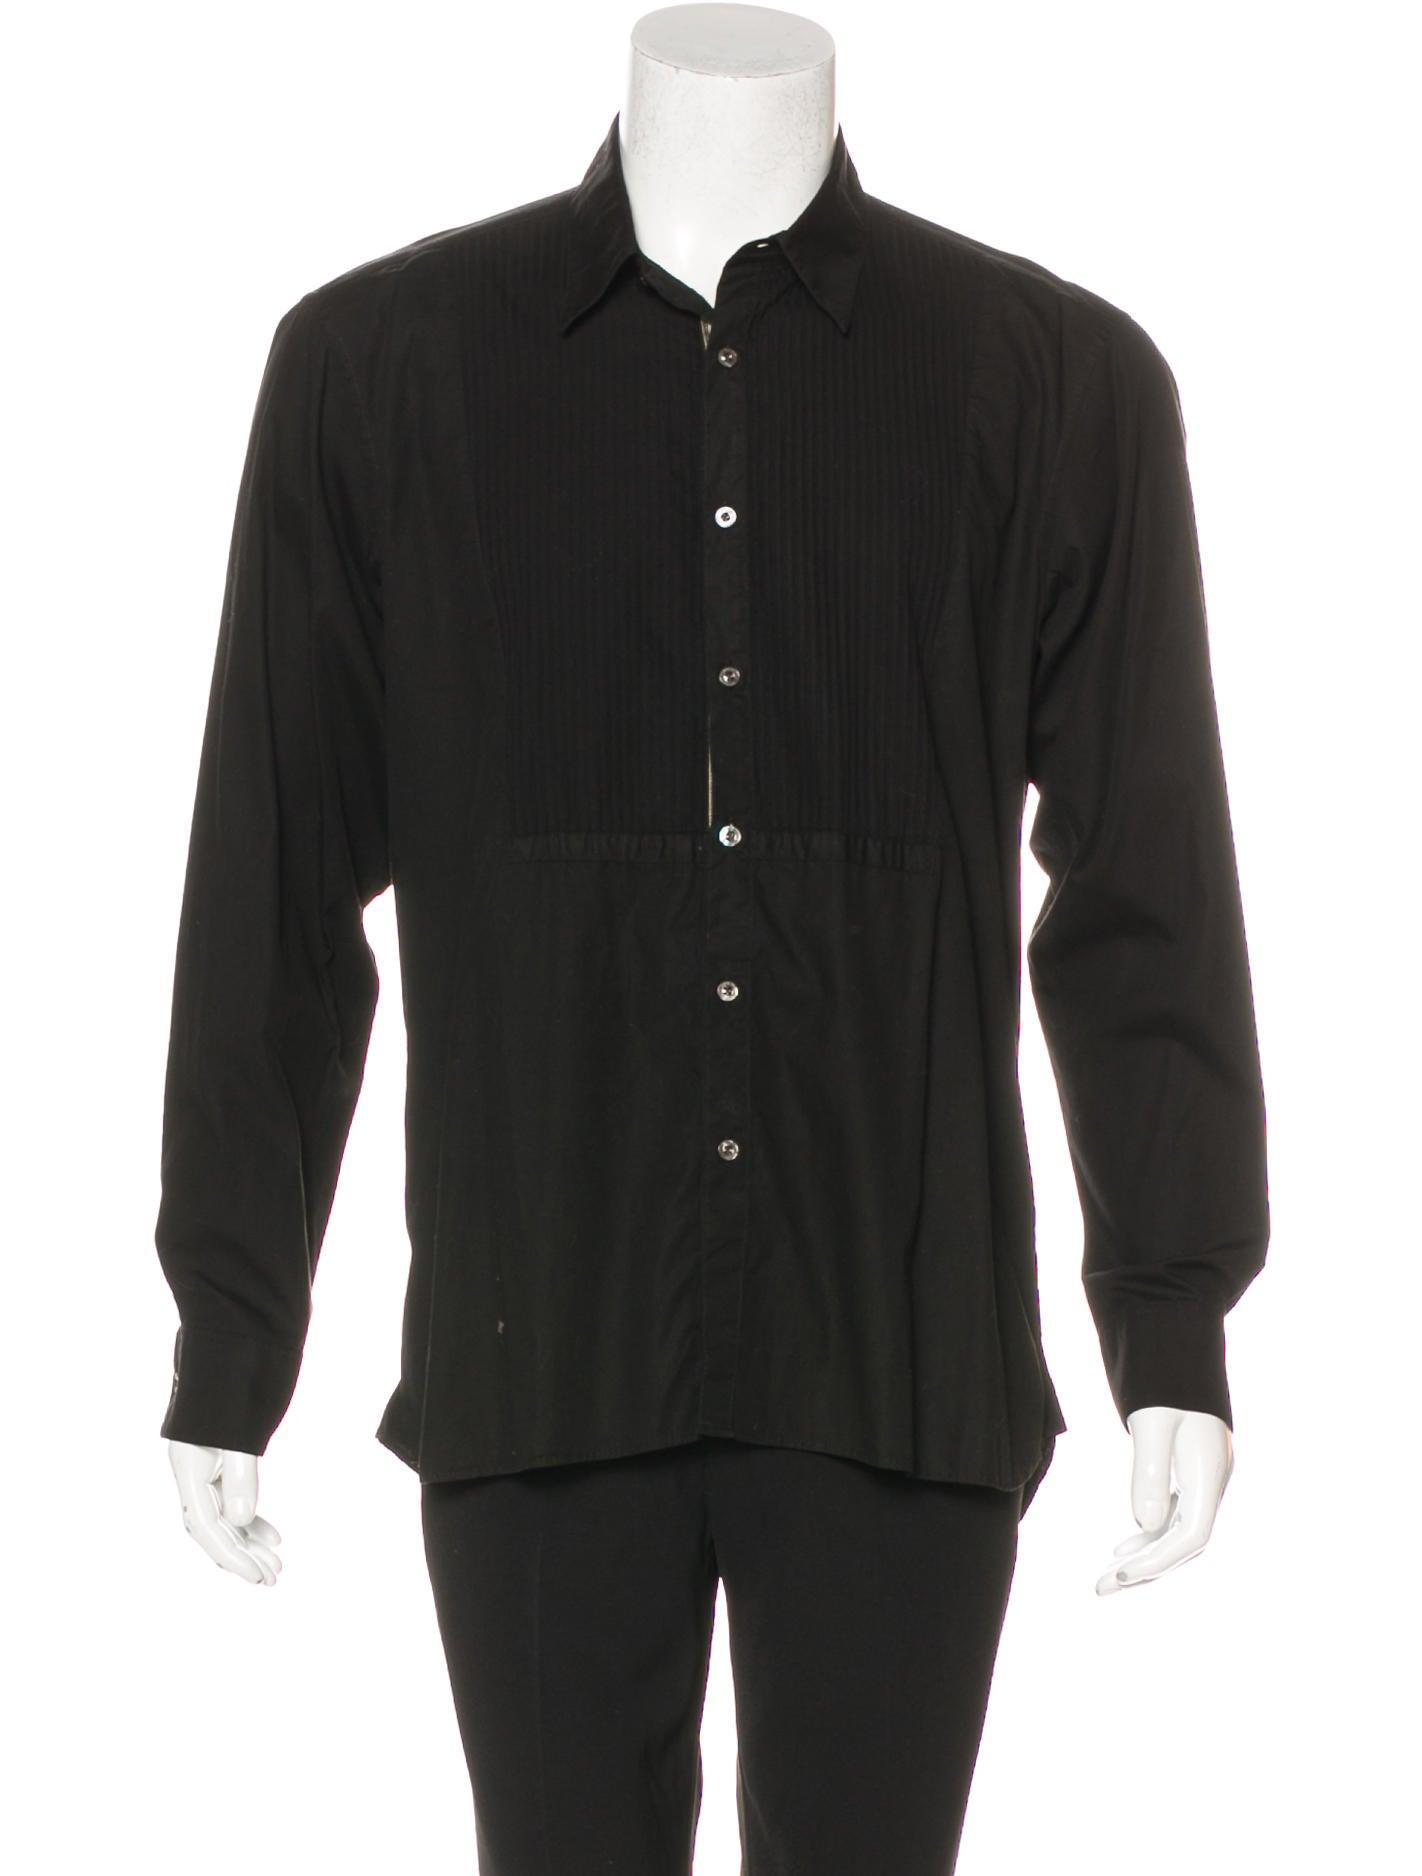 Burberry London Pleated Dress Shirt Clothing